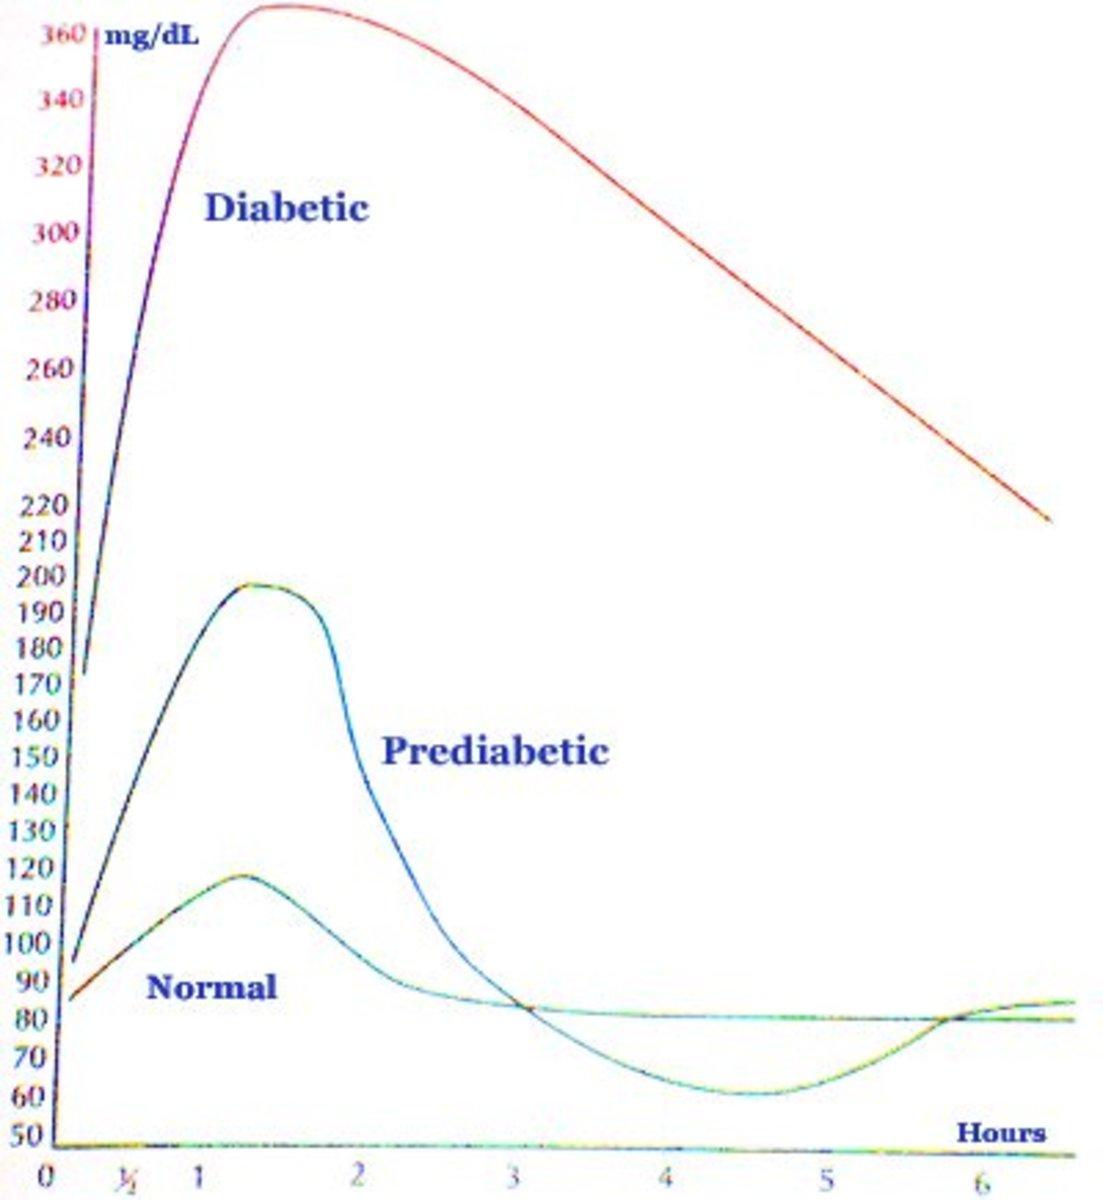 diabetic glucose level chart